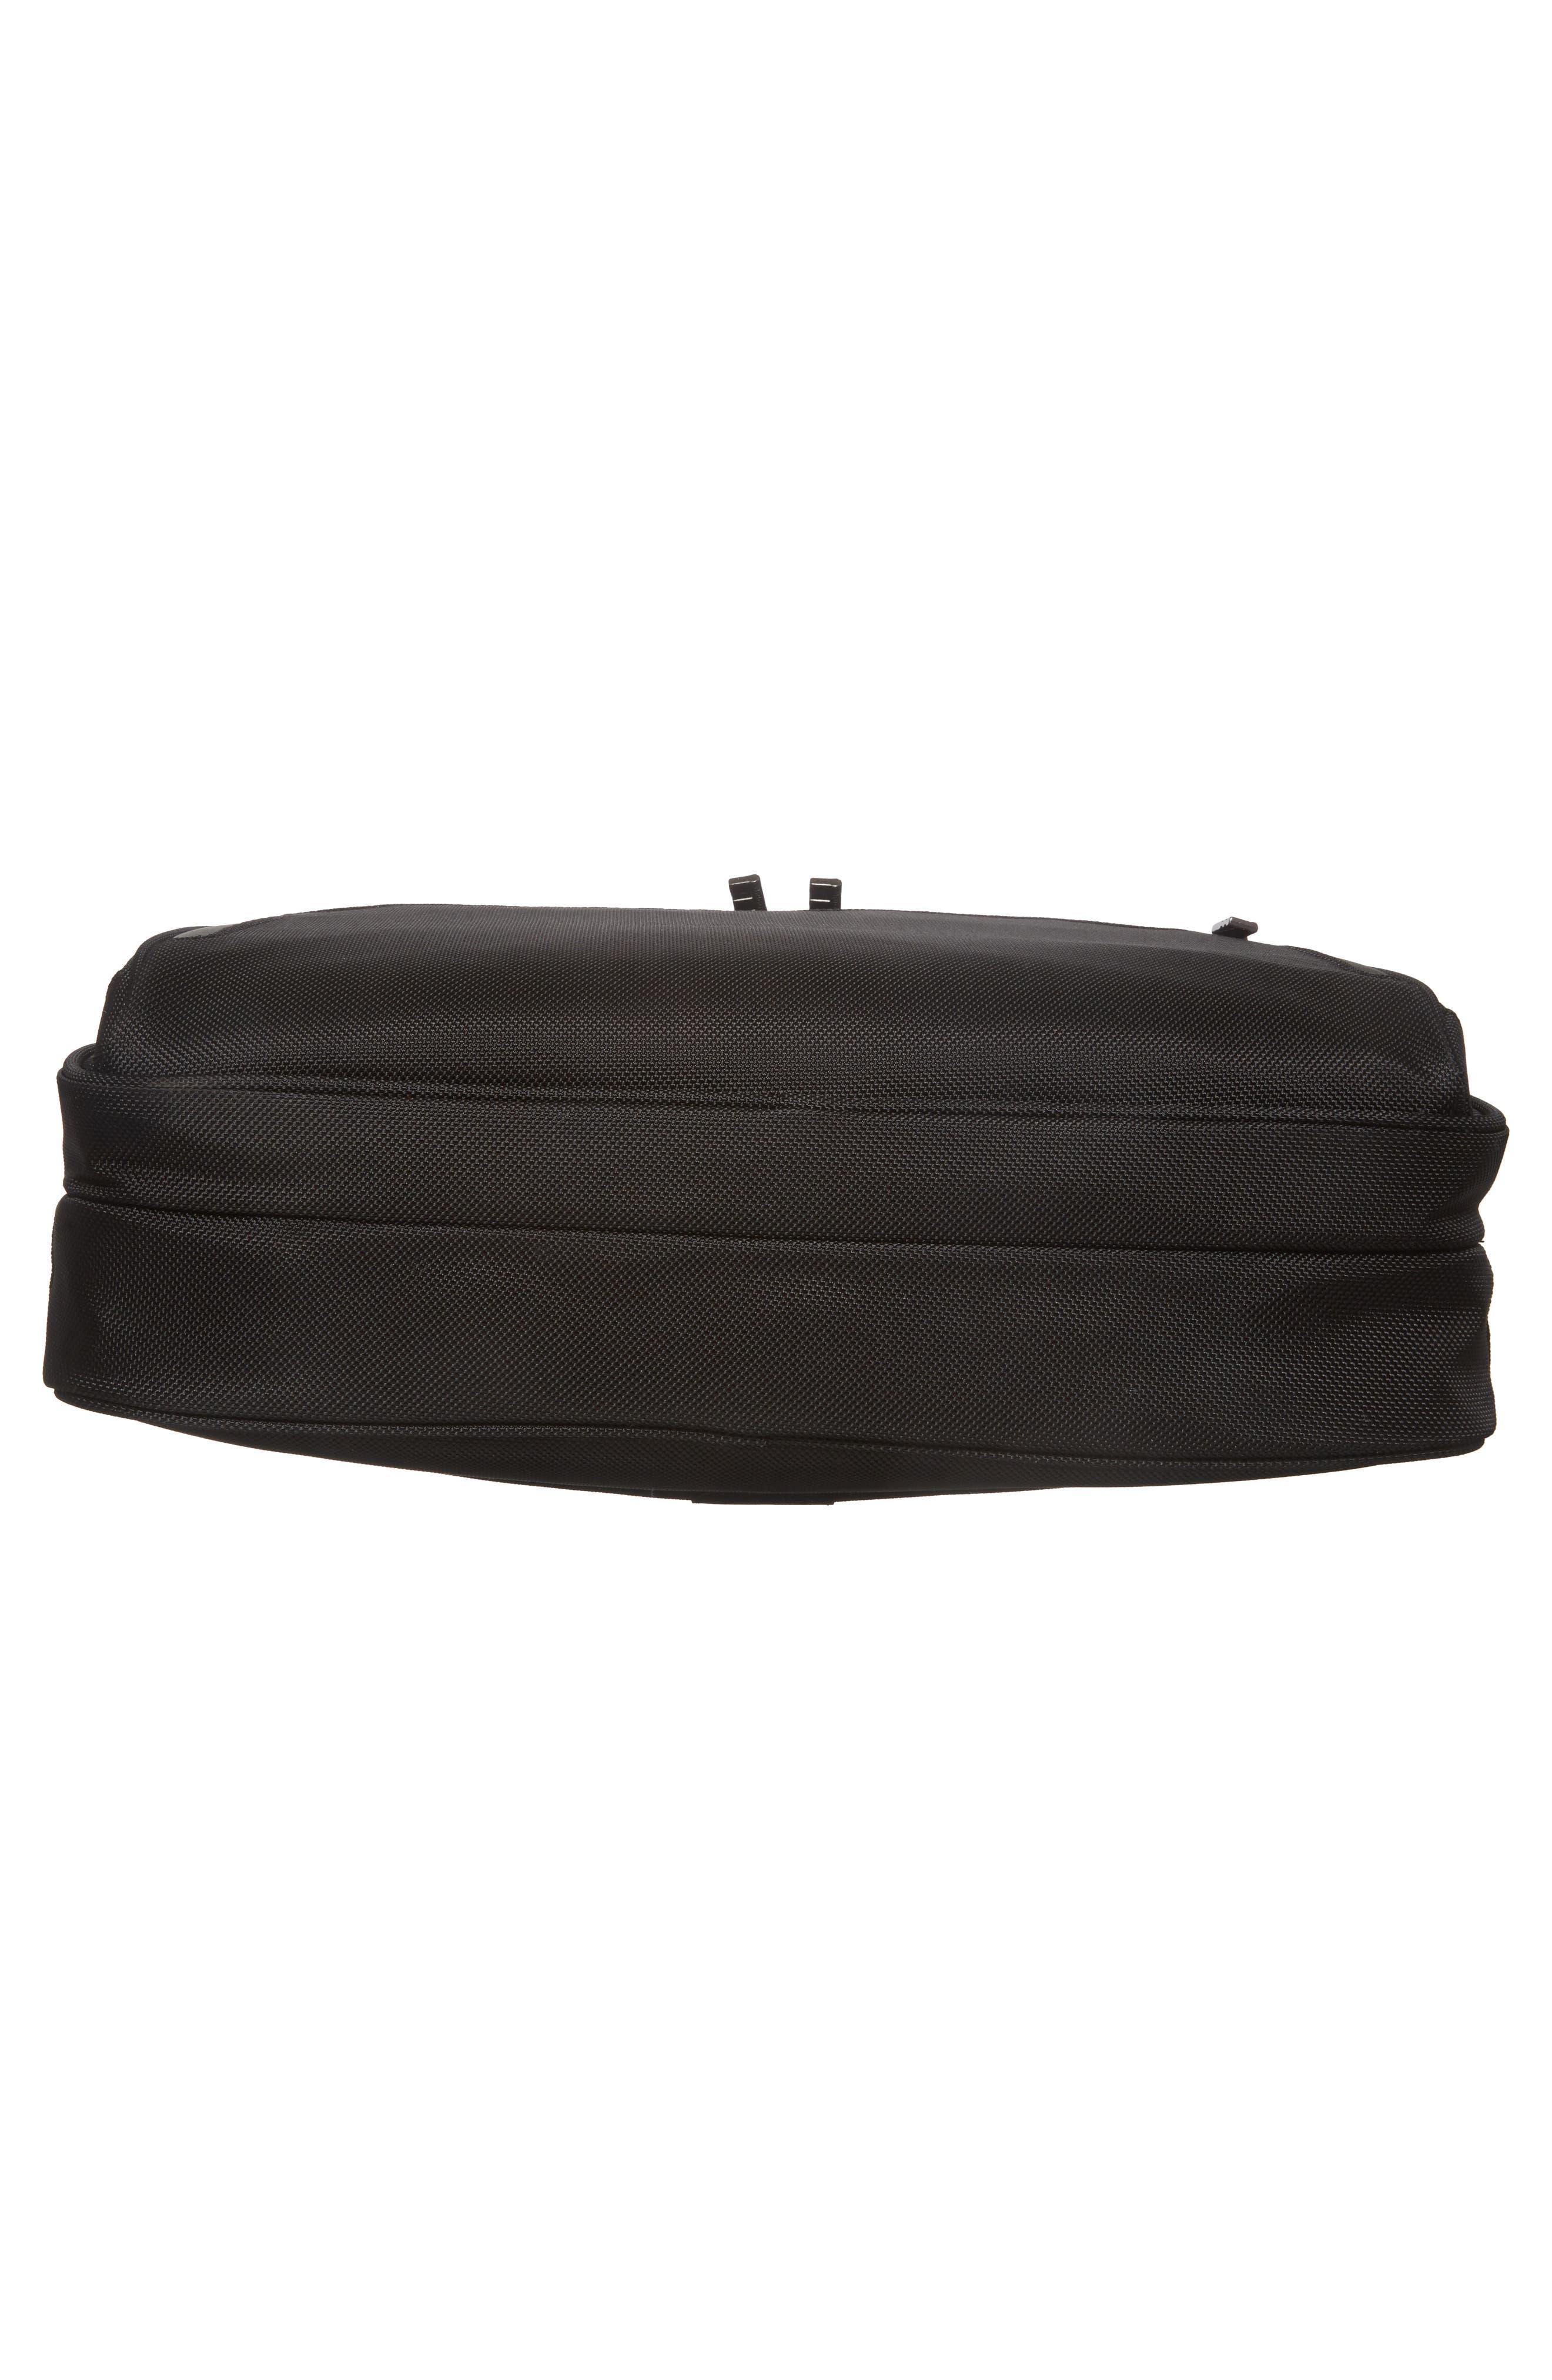 'Medium' Ballistic Nylon Briefcase,                             Alternate thumbnail 7, color,                             004